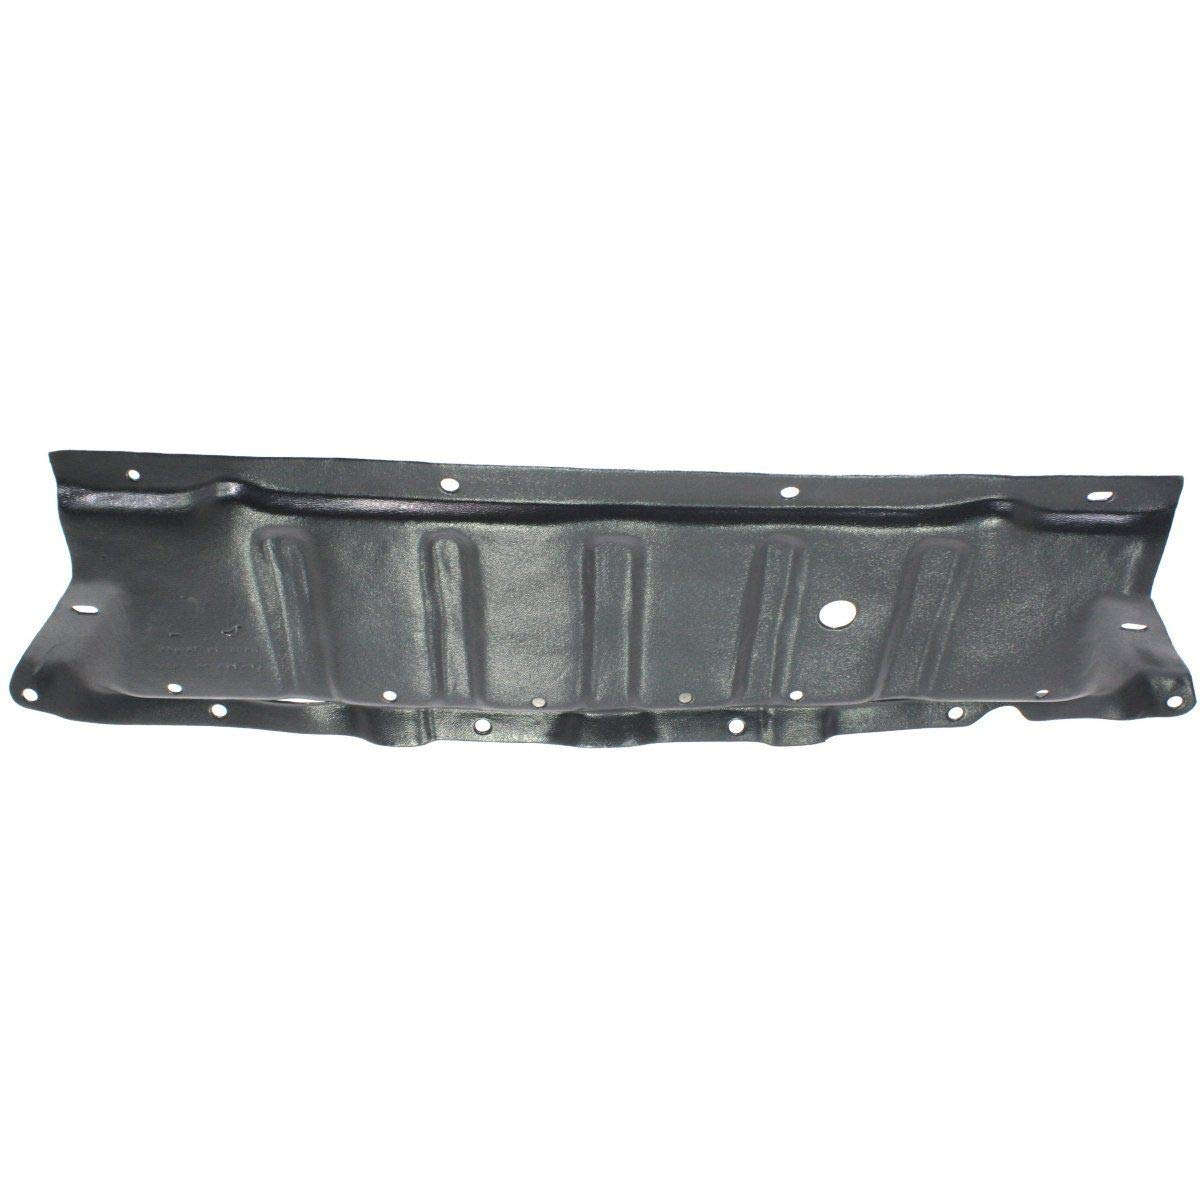 New Undercar Shield For 1999-2003 Lexus RX300 LX1228100 5144148010